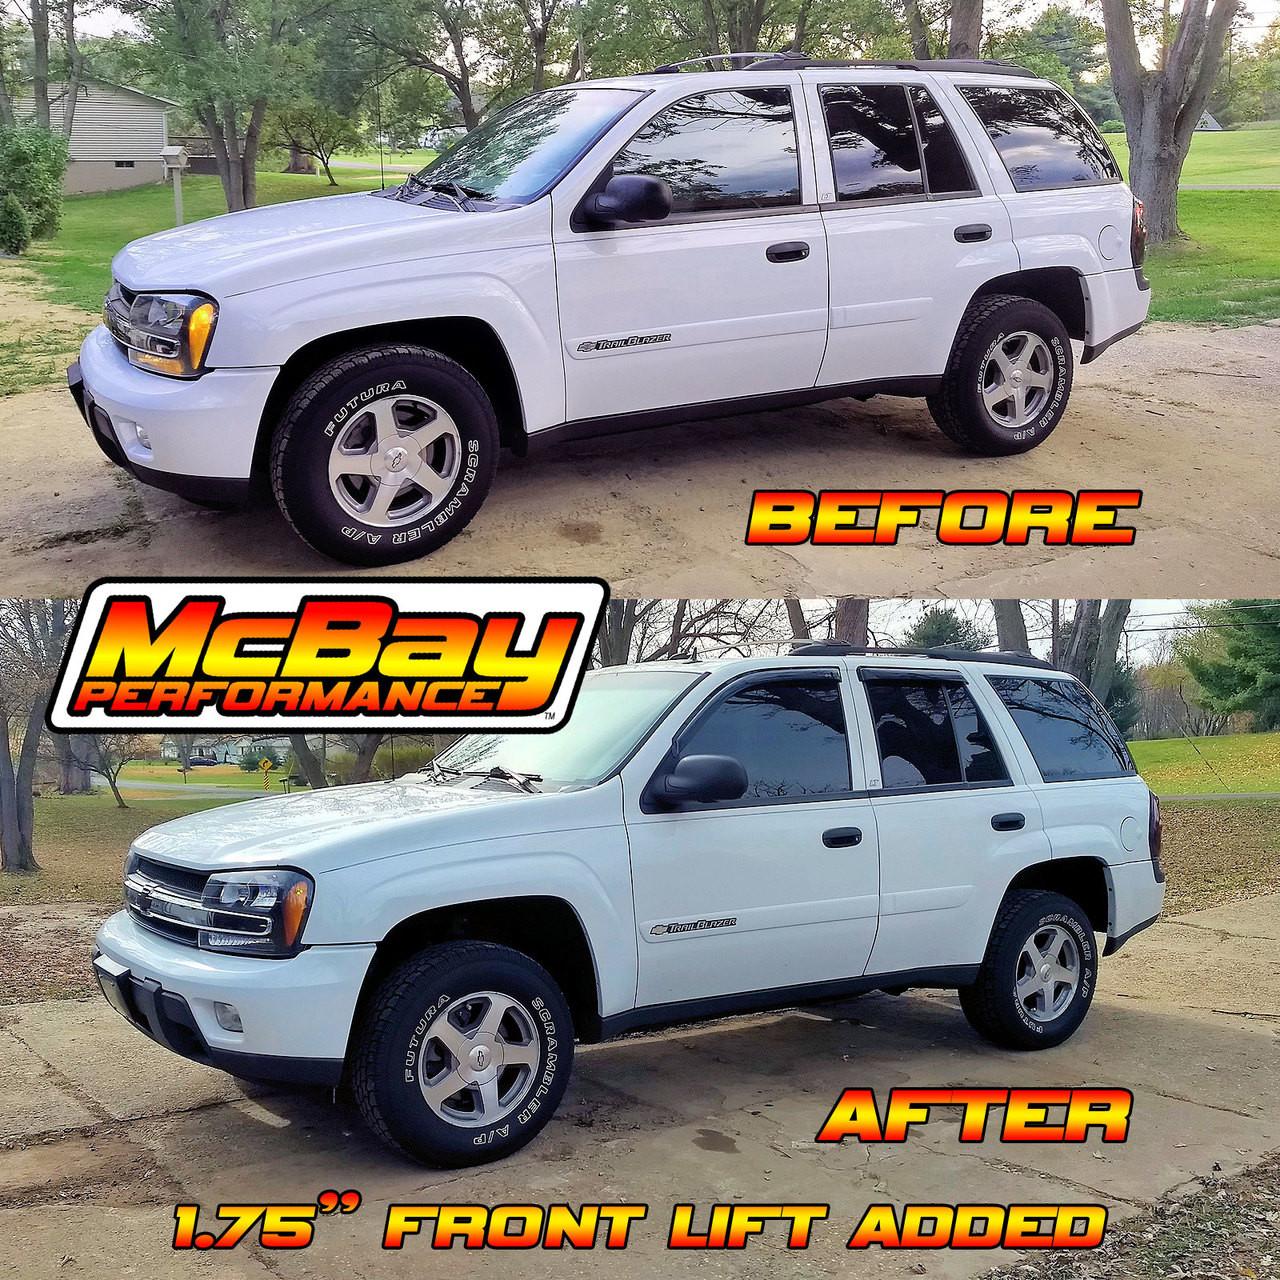 2002 2009 Chevrolet Trailblazer Gmc Envoy 1 75 Or 2 5 Front Lift Leveling Kit